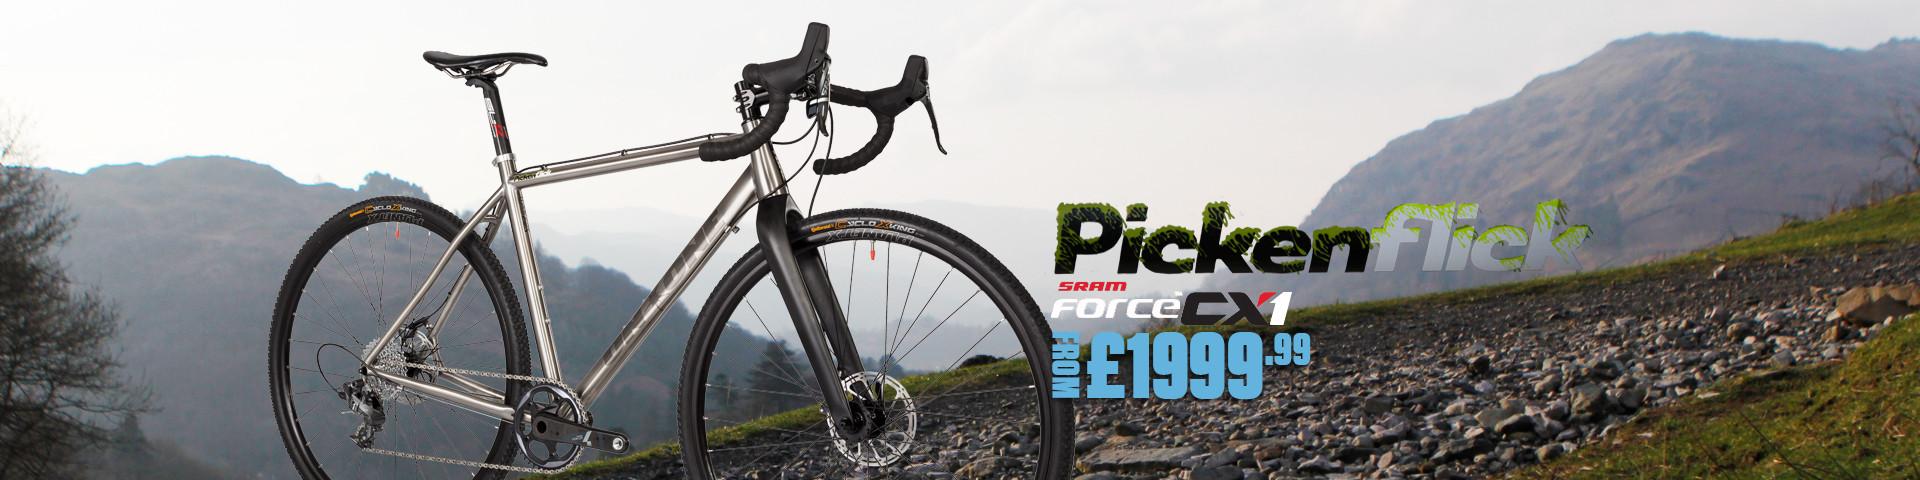 Pickenflick CX1